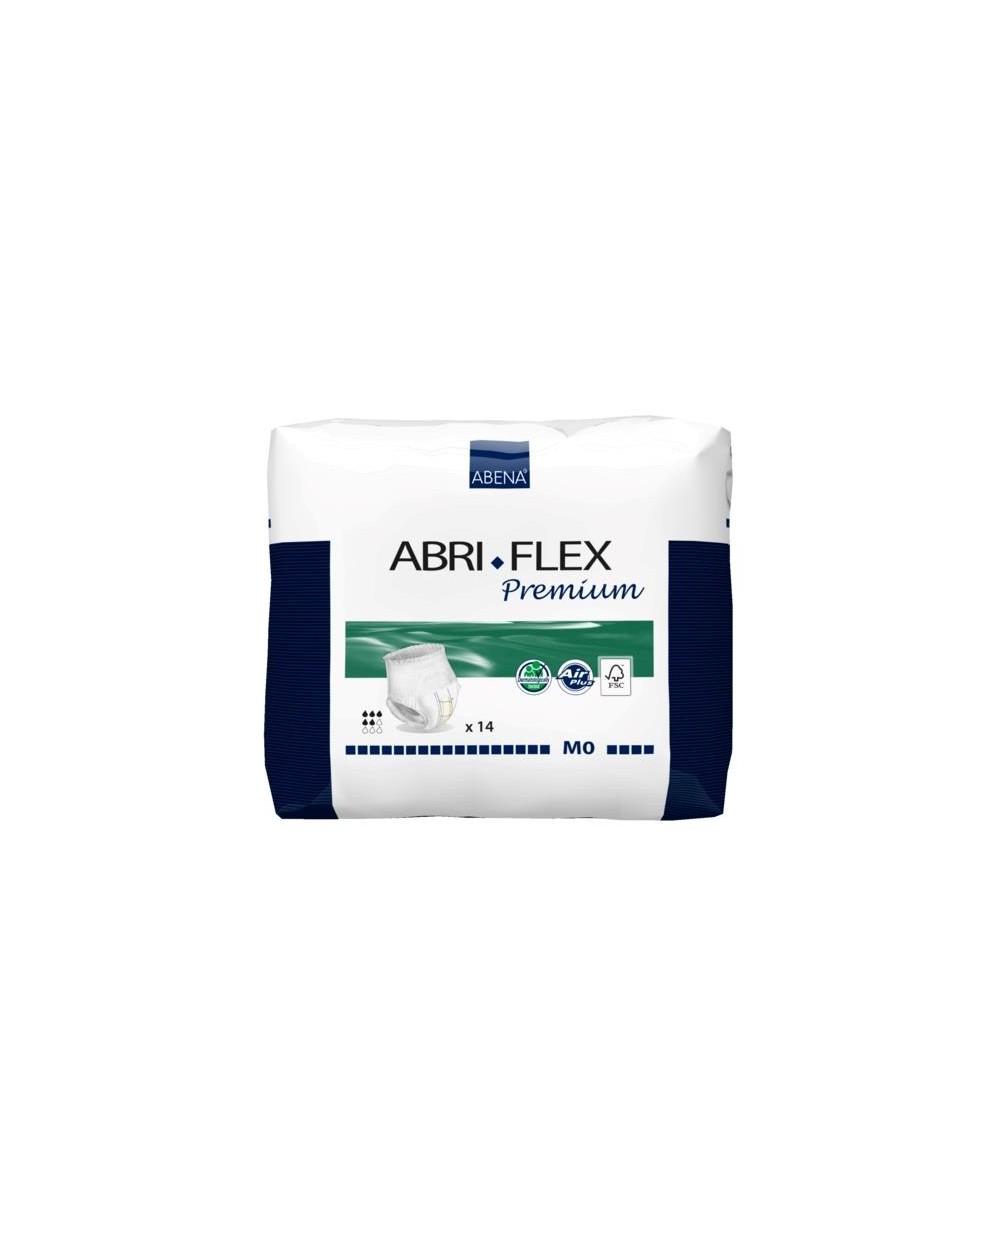 Abena Abri-Form 0 Medium - 26 protections